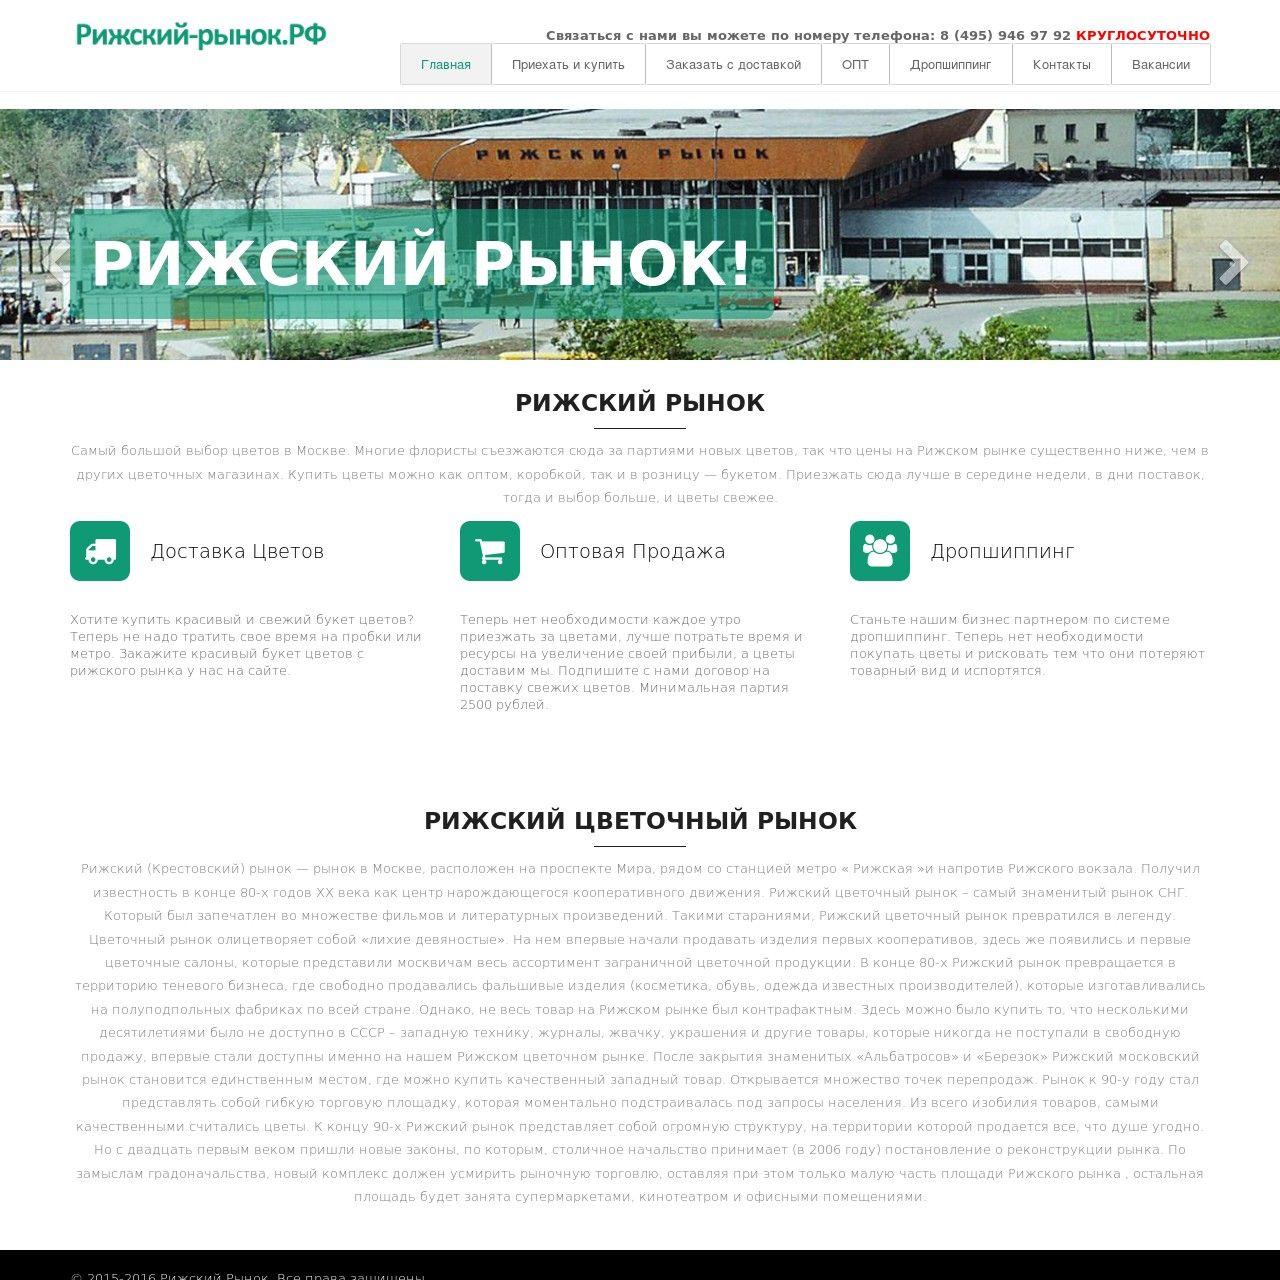 Wordpress Site Xn Ktbfbfedxjmgh9kxn P1ai Uses The Avnii